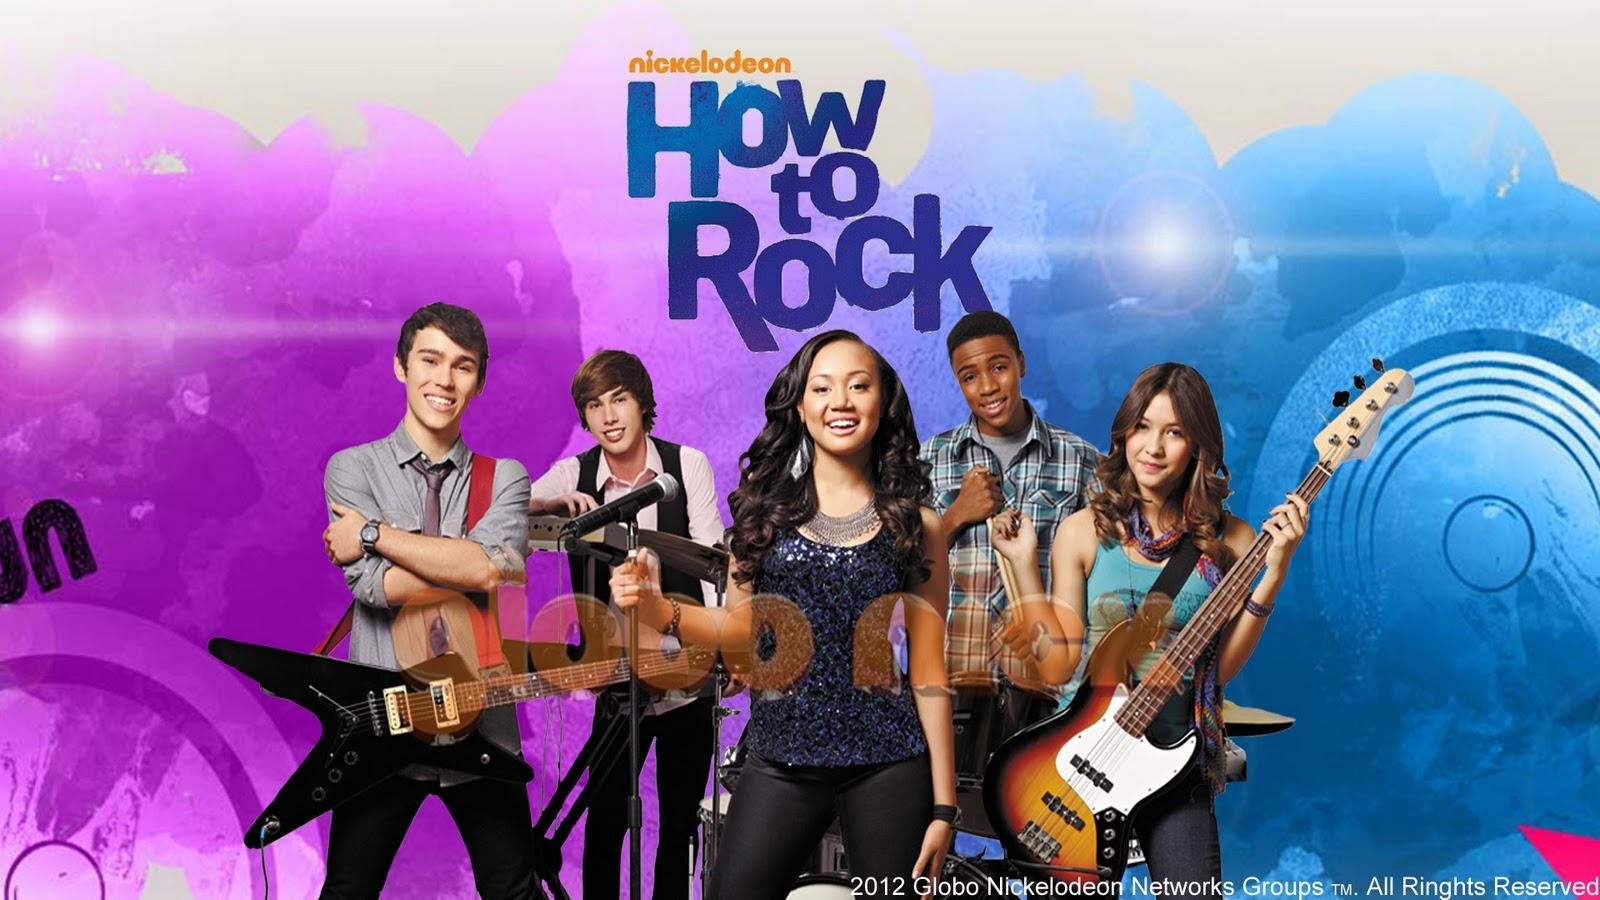 http://4.bp.blogspot.com/-f3ajrwMobAY/TydfXKLlXWI/AAAAAAAADd4/RC7E9b9NYcs/s1600/How_To_Rock_1920x1080.jpg